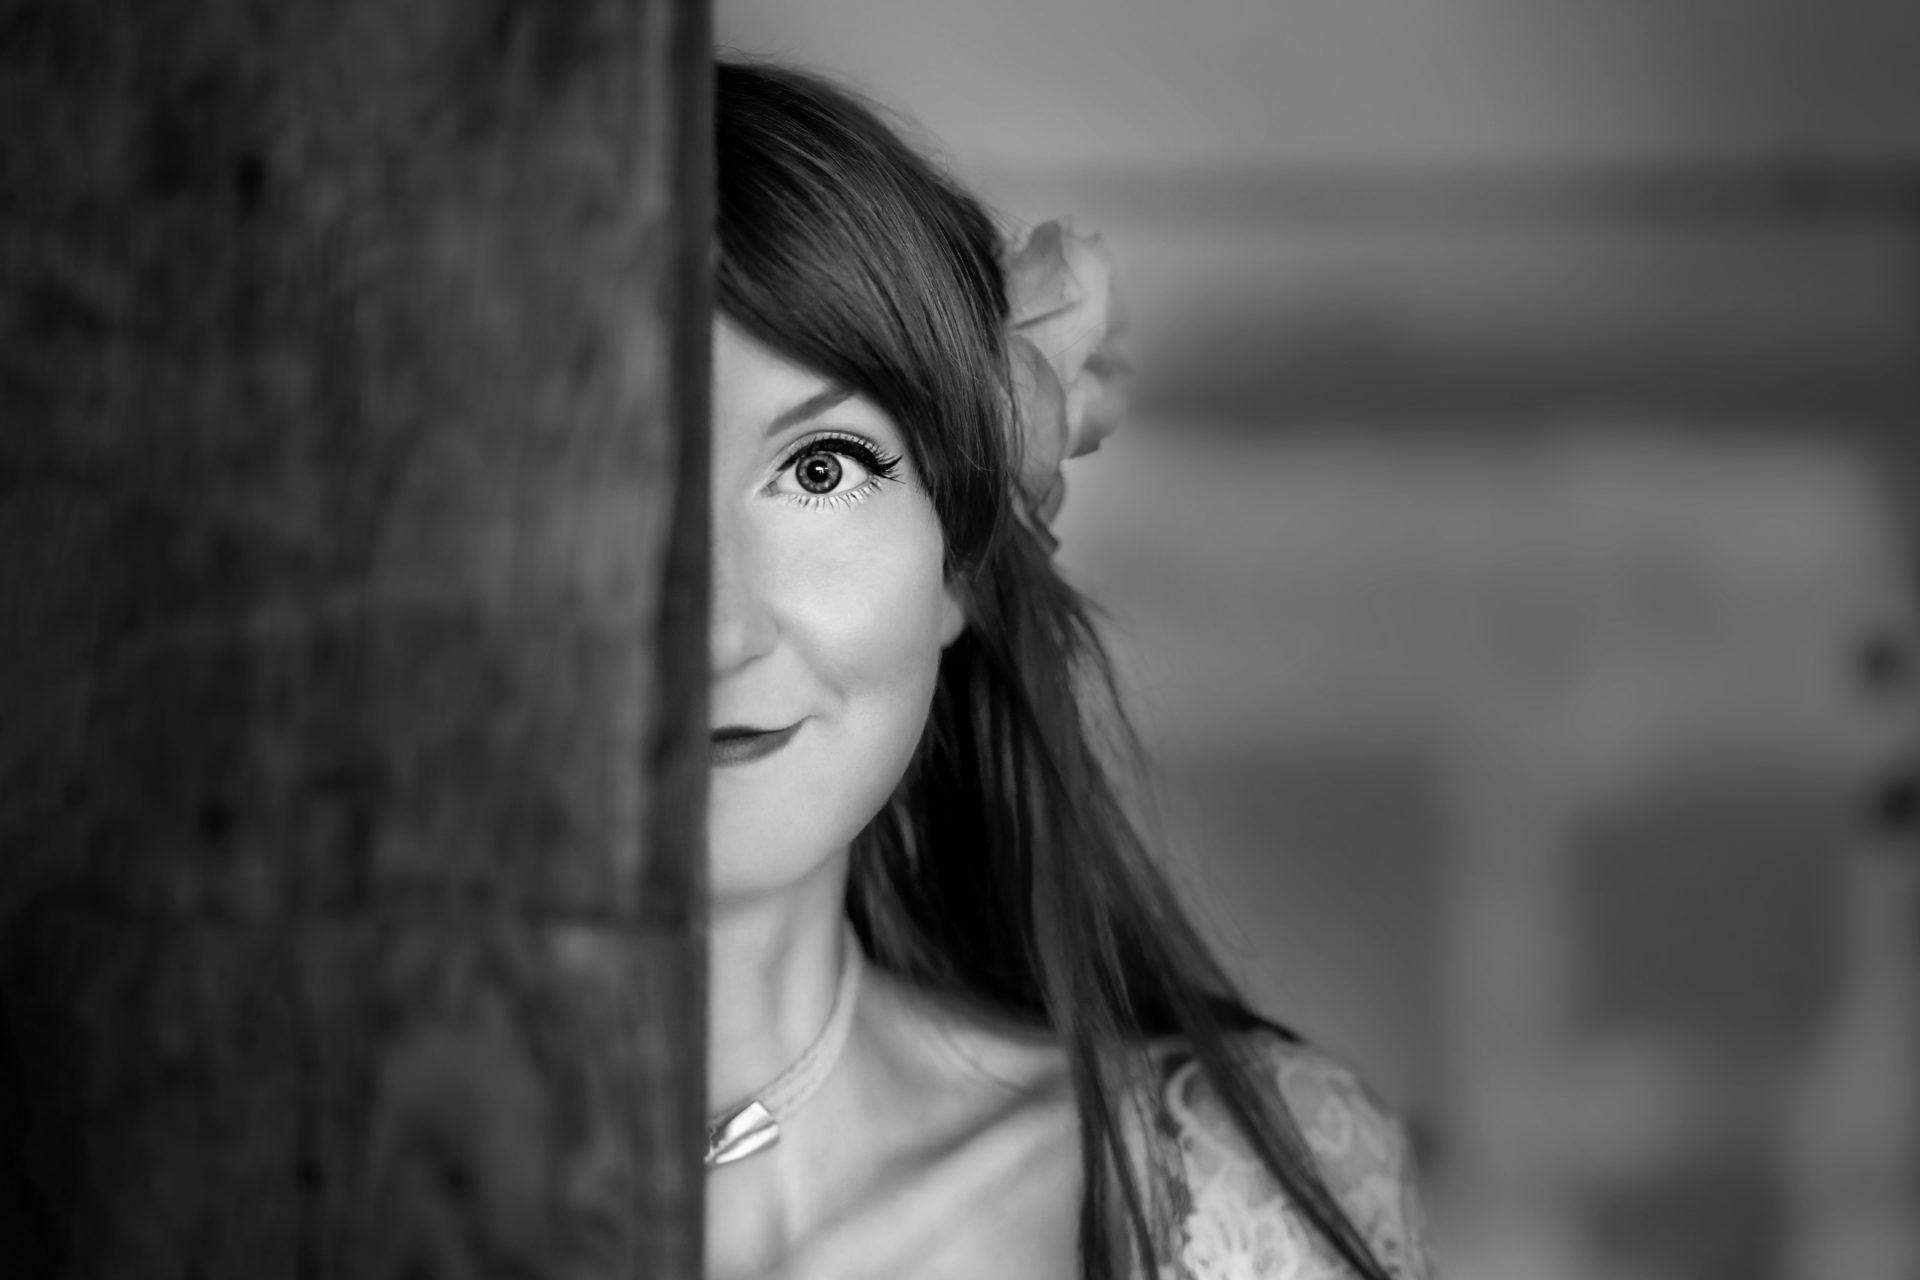 LENA MARIE SANDKÜHLER